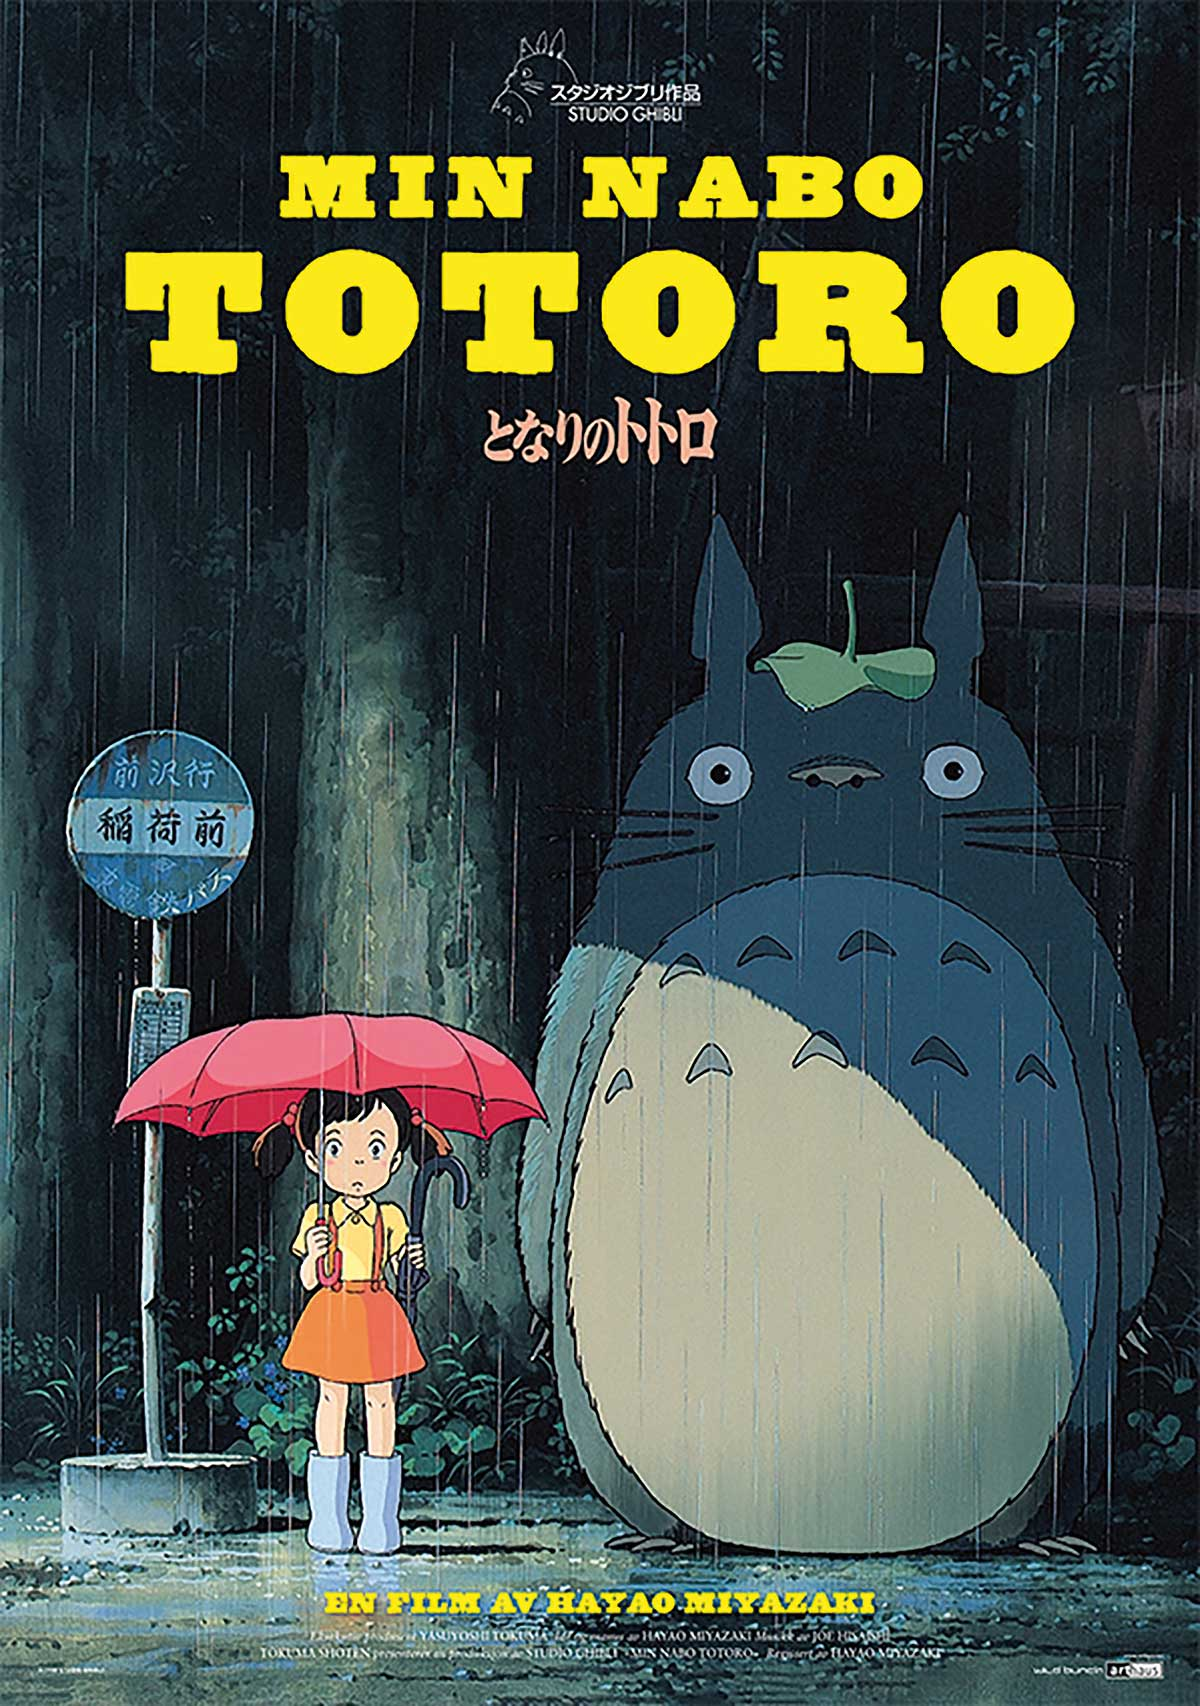 Norsk kinoplakat: Min nabo Totoro